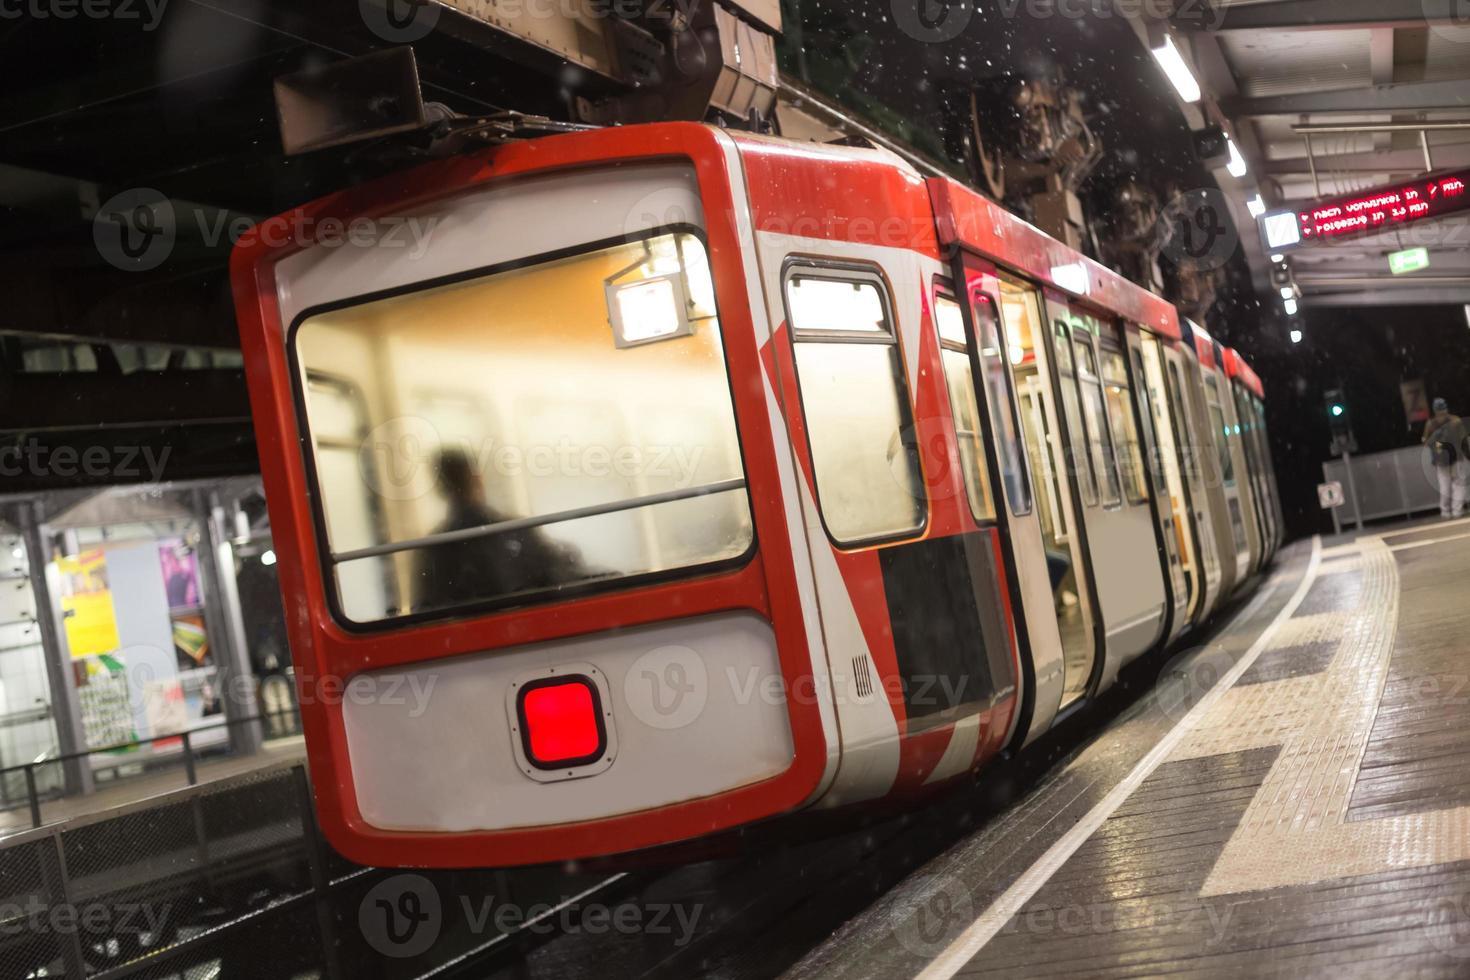 Train schwebebahn wuppertal allemagne un soir d'hiver photo